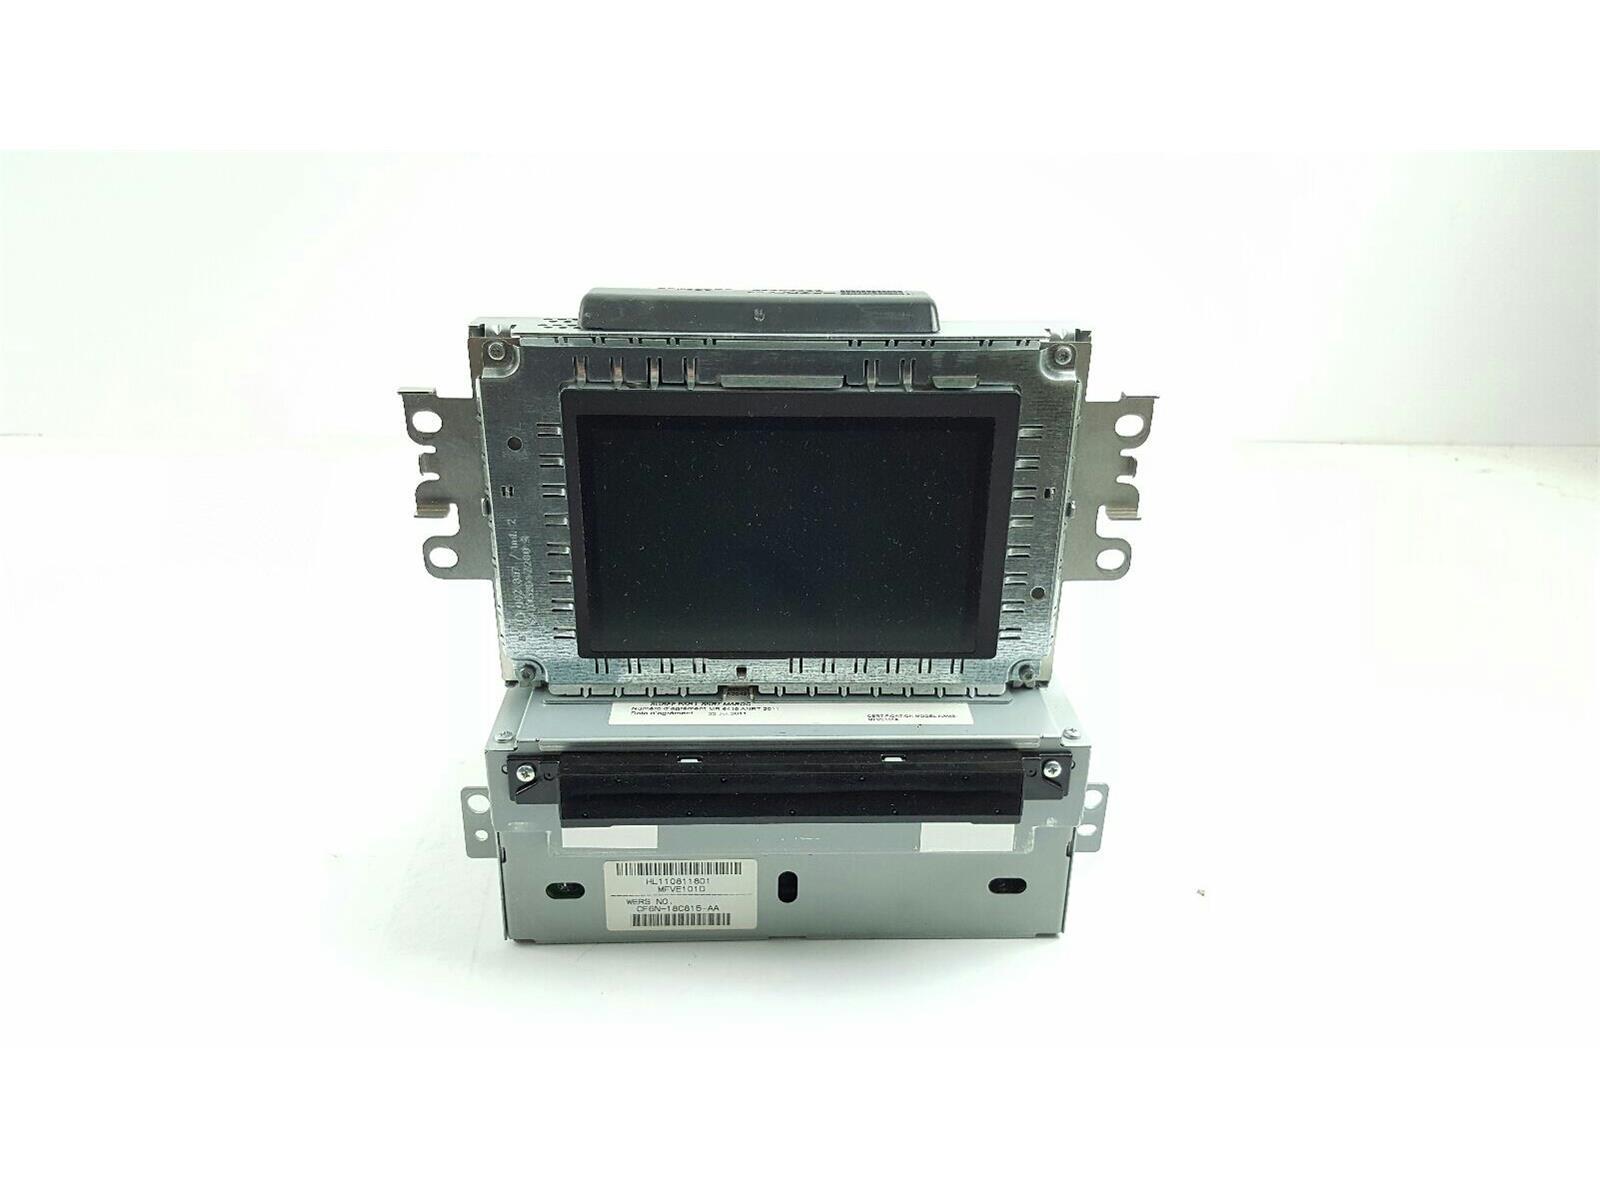 Volvo V40 2012 To 2016 Radio CD Player (Diesel / Manual) for